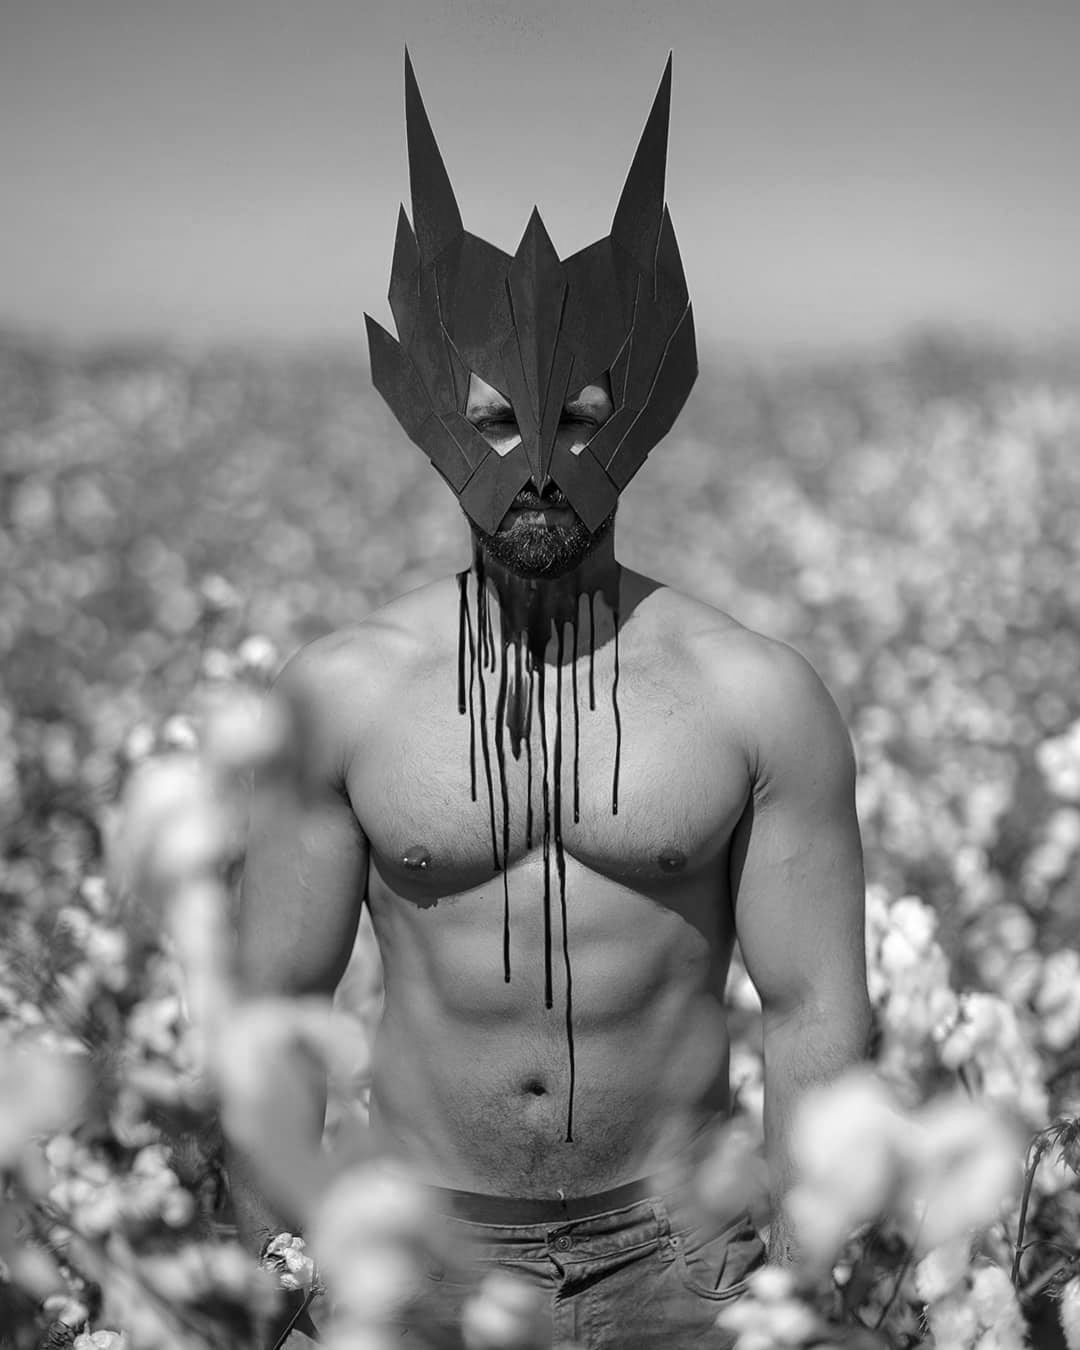 MasK (I), by Shlomi Gavrialy ft Daniel Gueta.